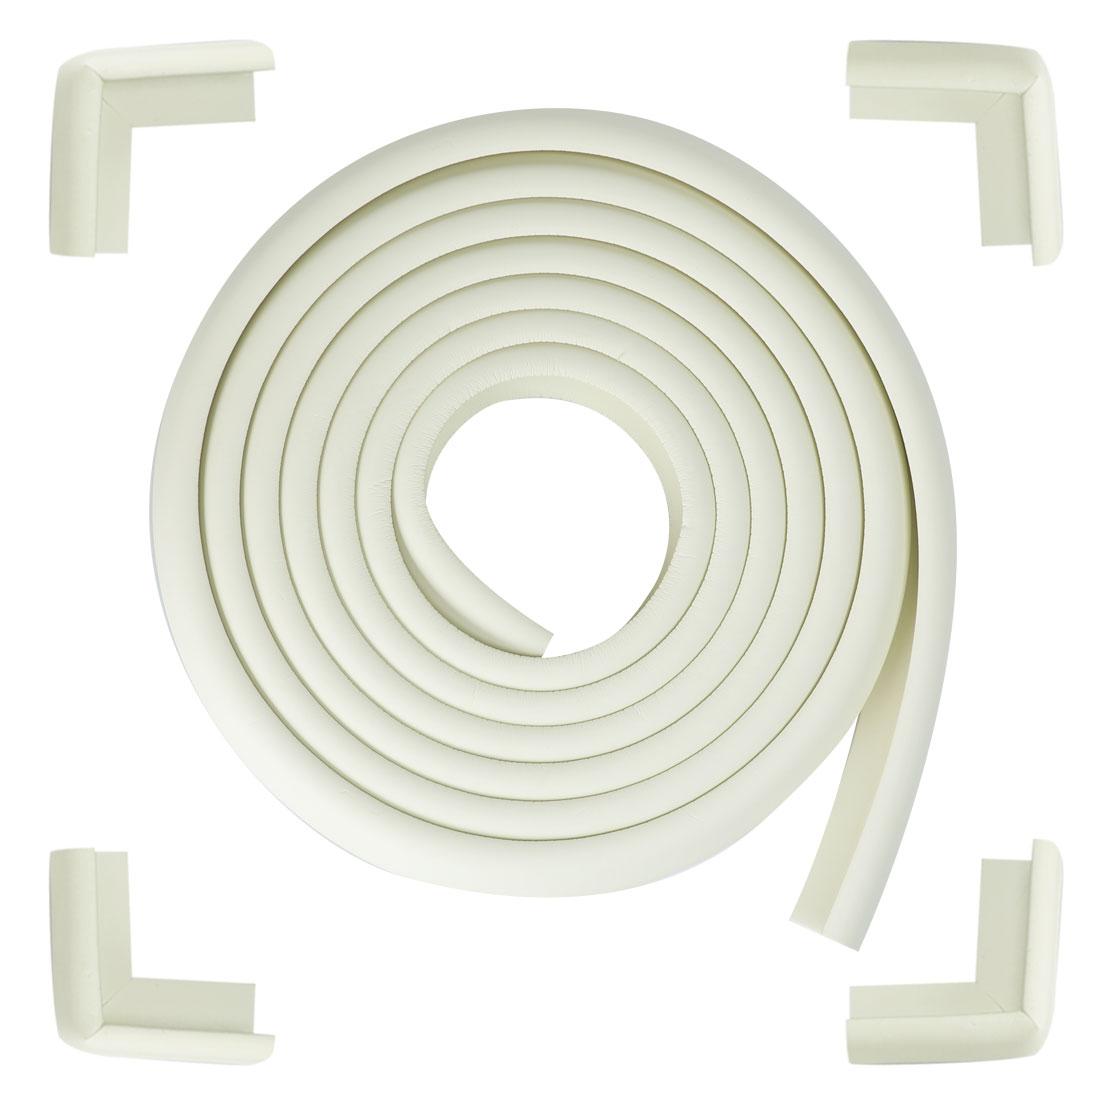 16.4ft + 4 Corner Cushions Desk Edge Corner Cushion Guard Protector, White Set